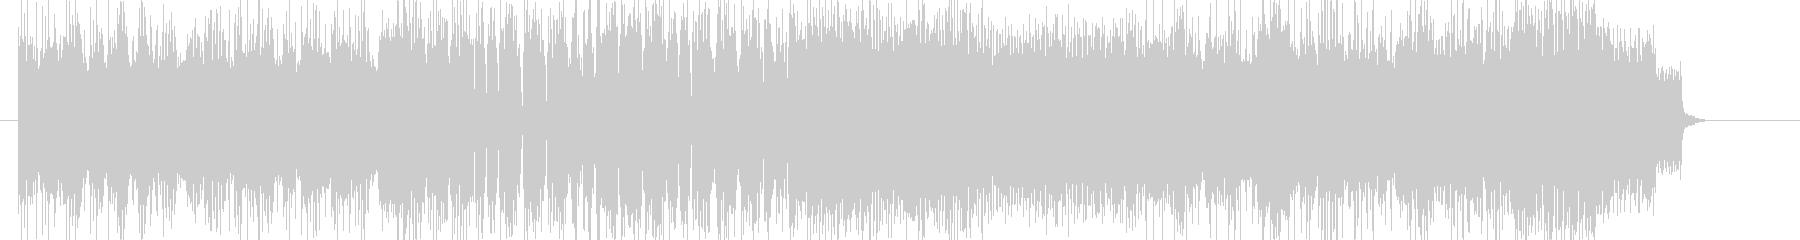 DEATHCORE/HARDCOREの未再生の波形